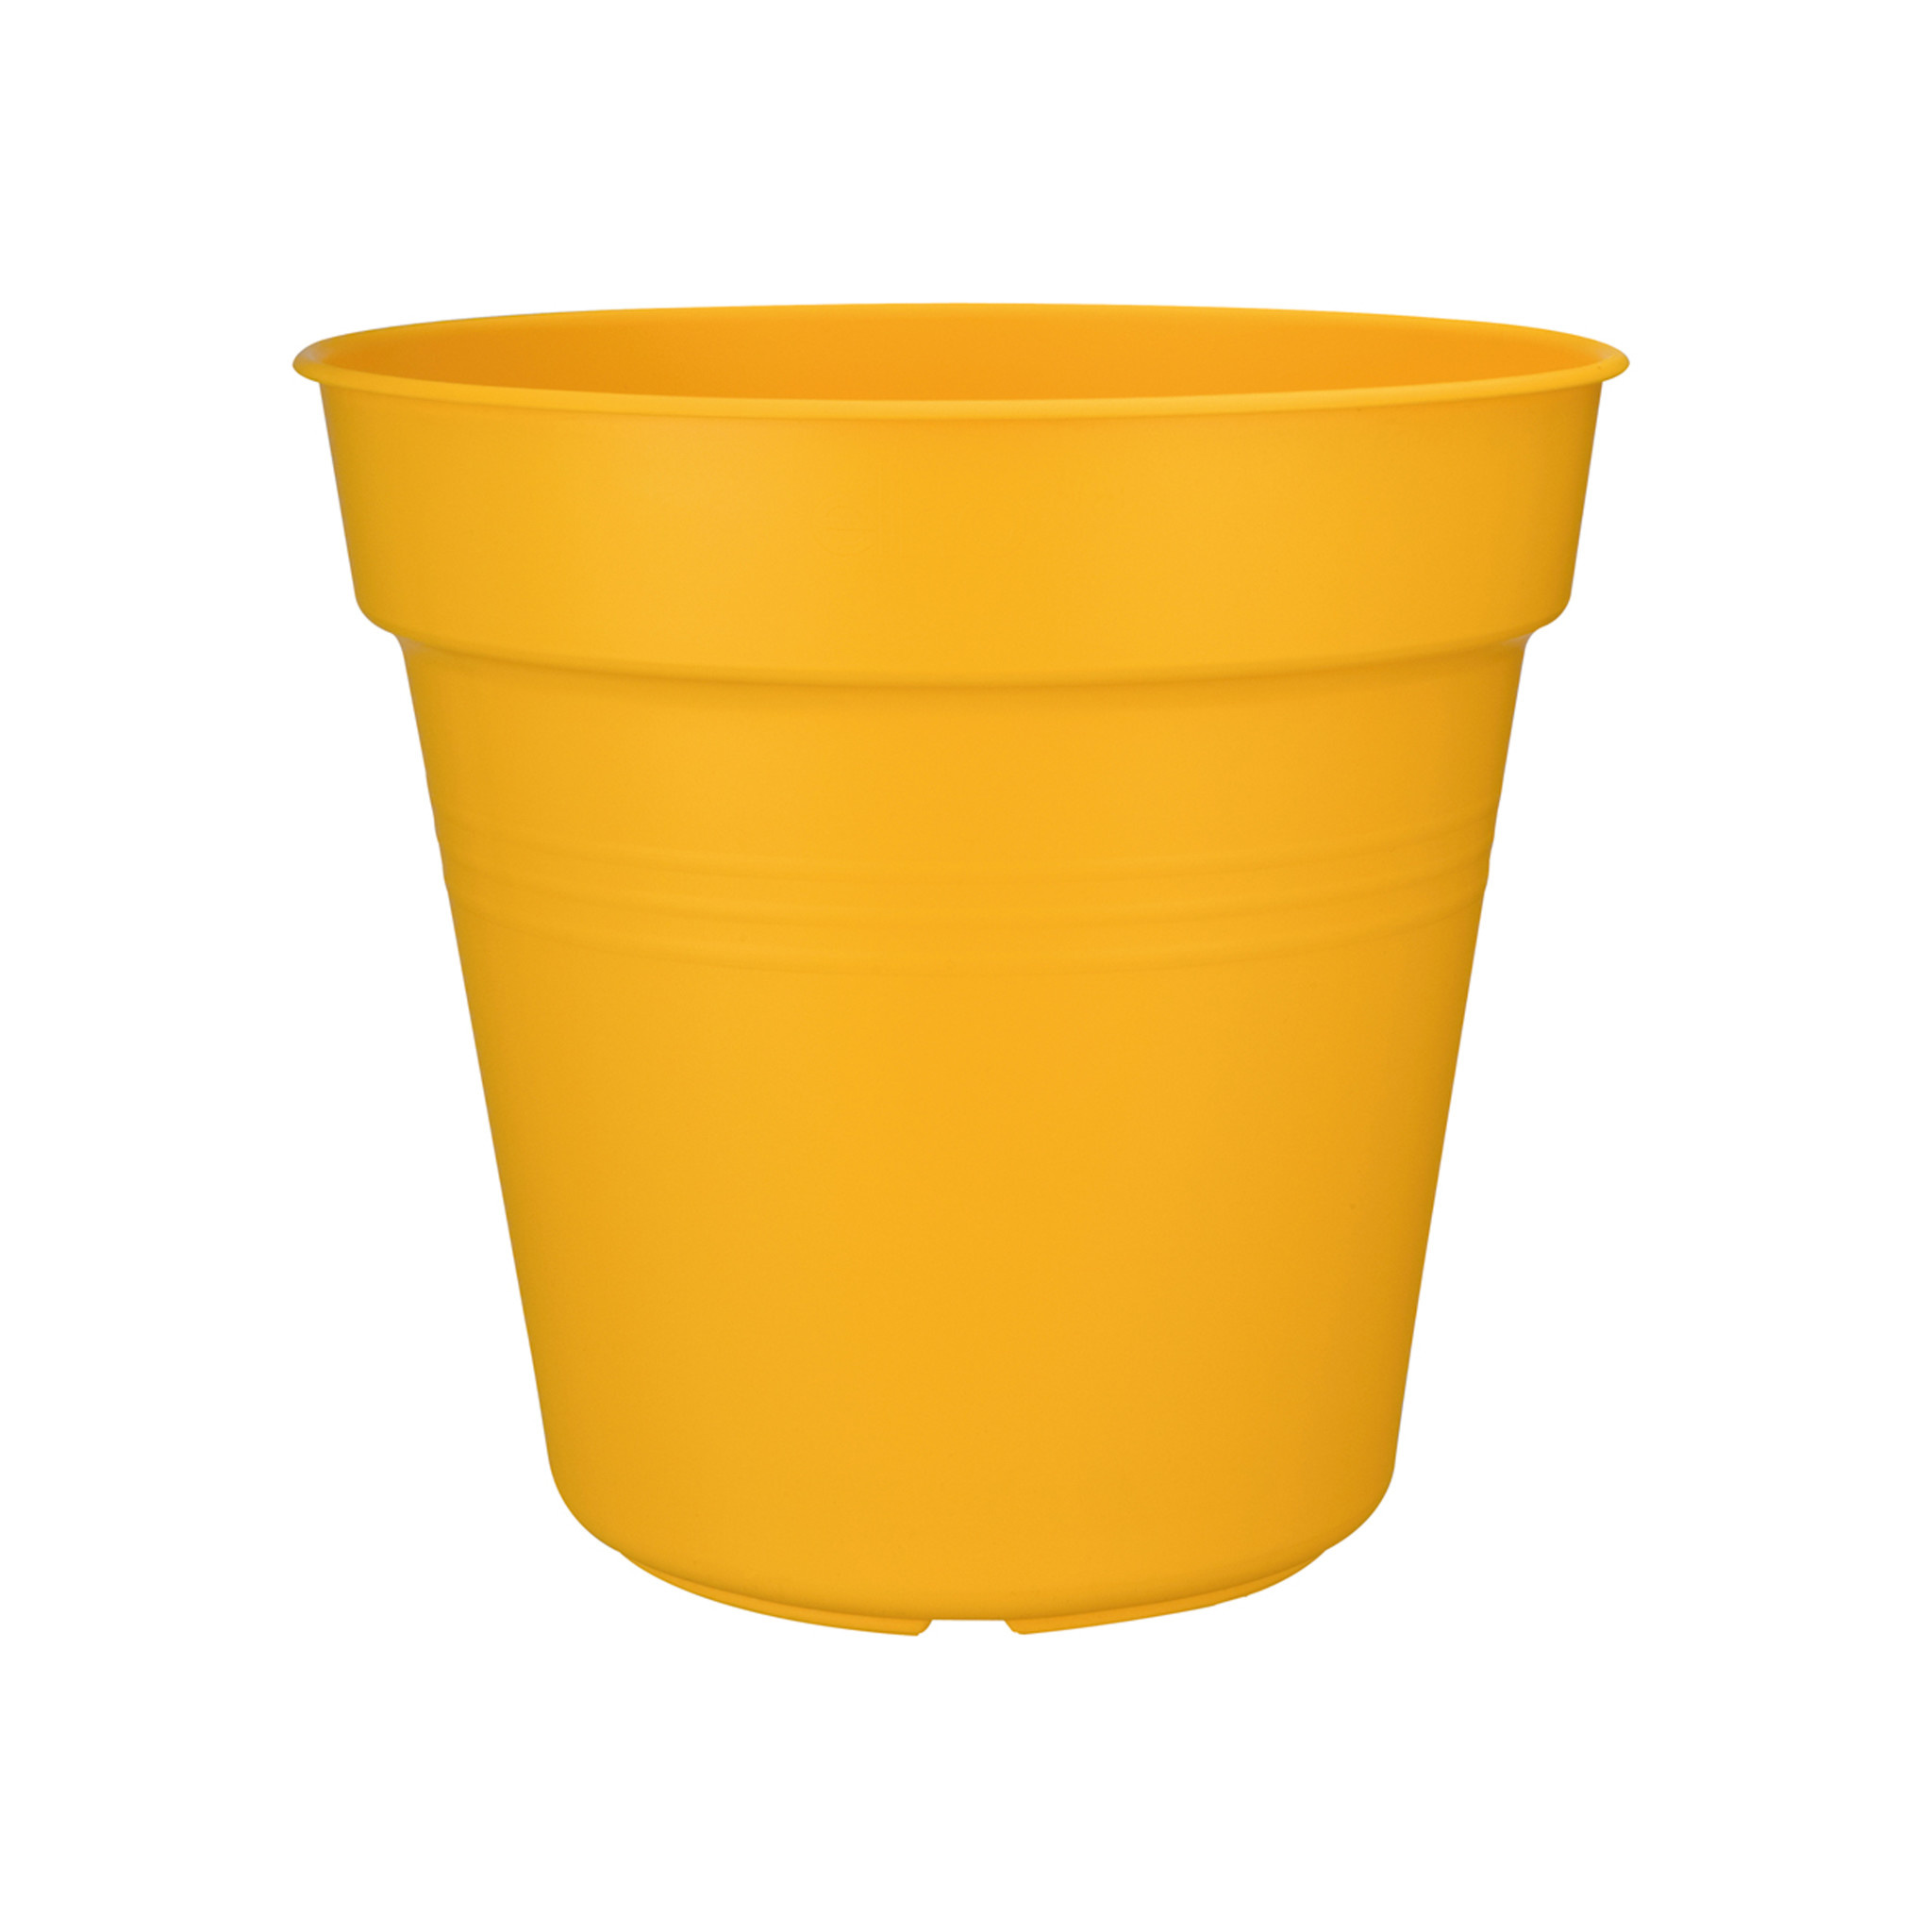 Elho Green Basics Kweekpot intens geel 30x27,6 cm